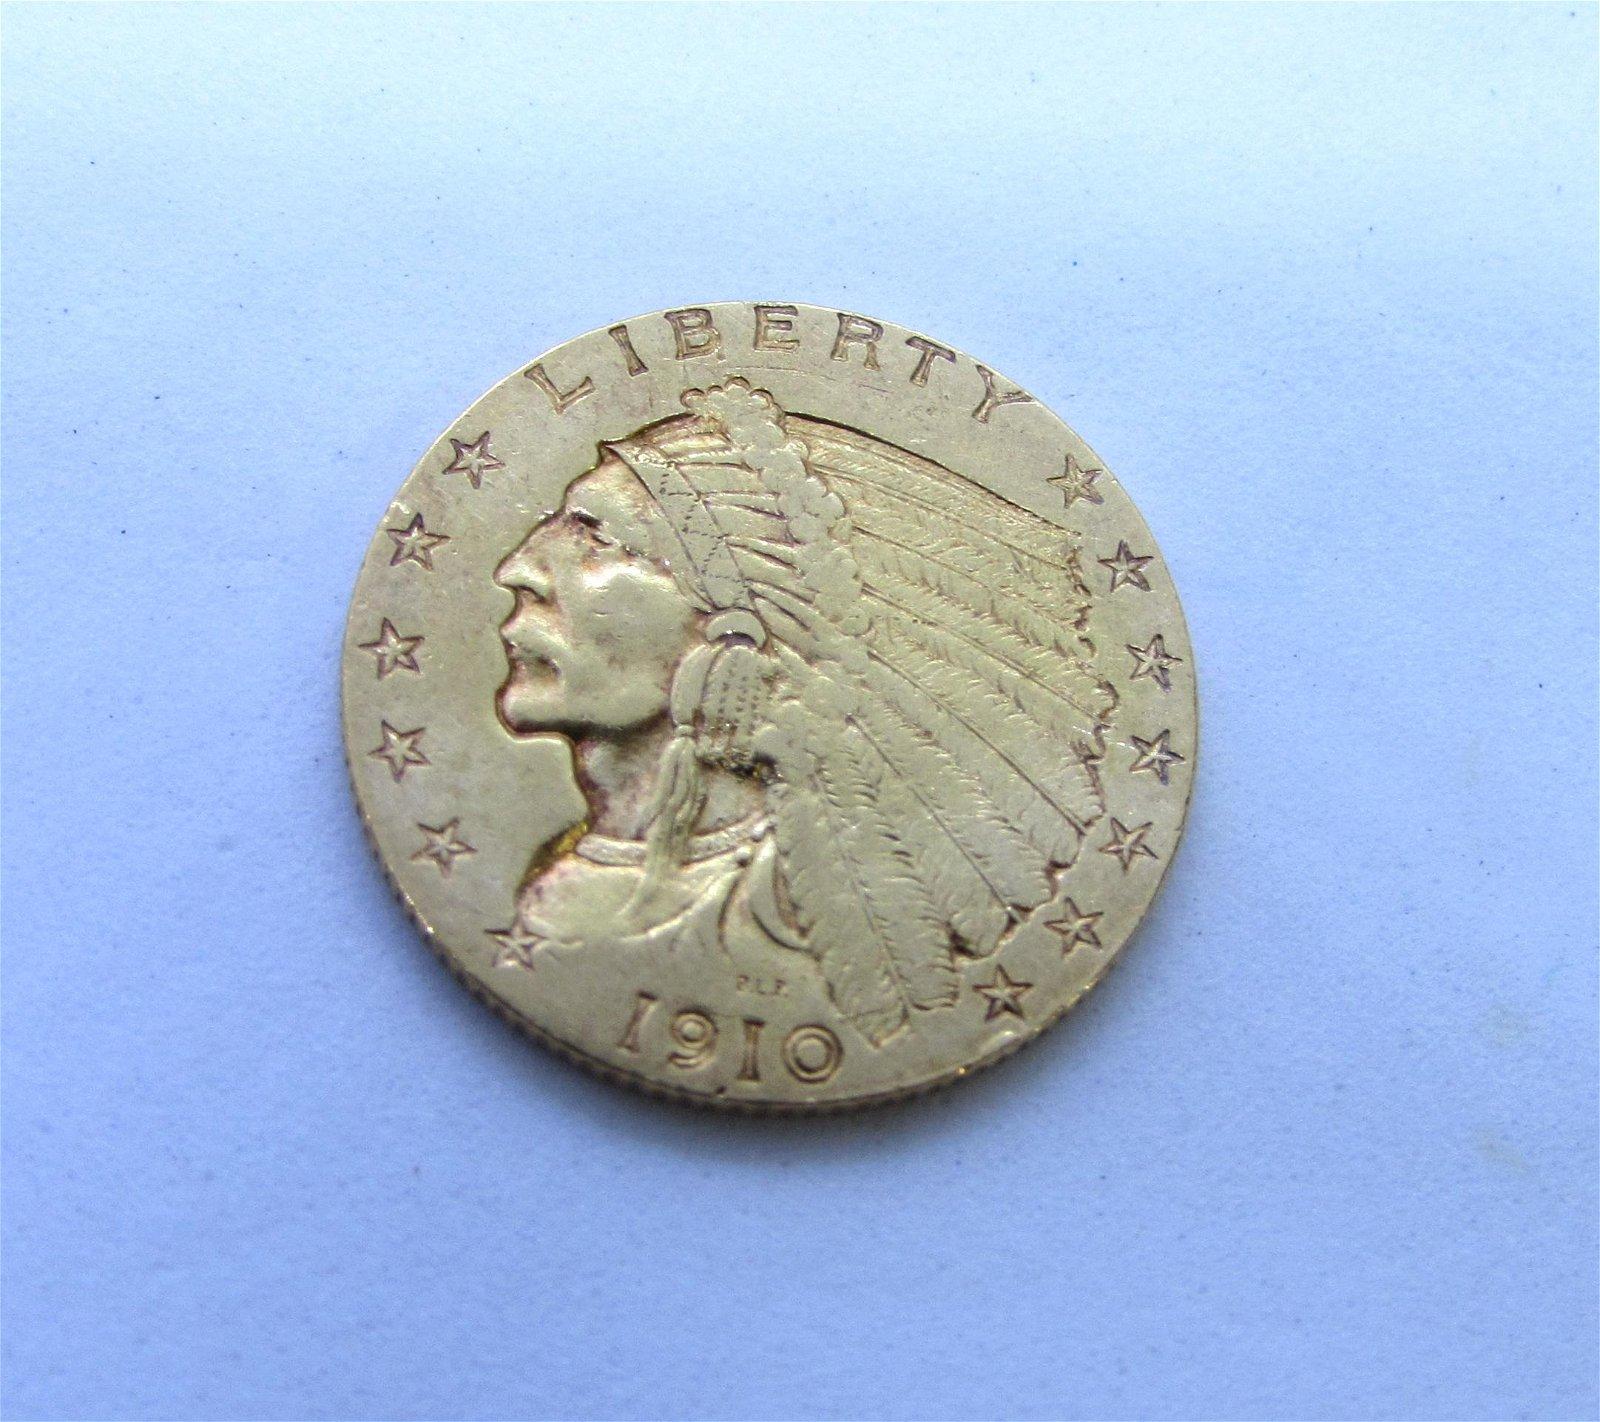 1910 INDIAN GOLD 2 1/2 DOLLAR US COIN $2.50